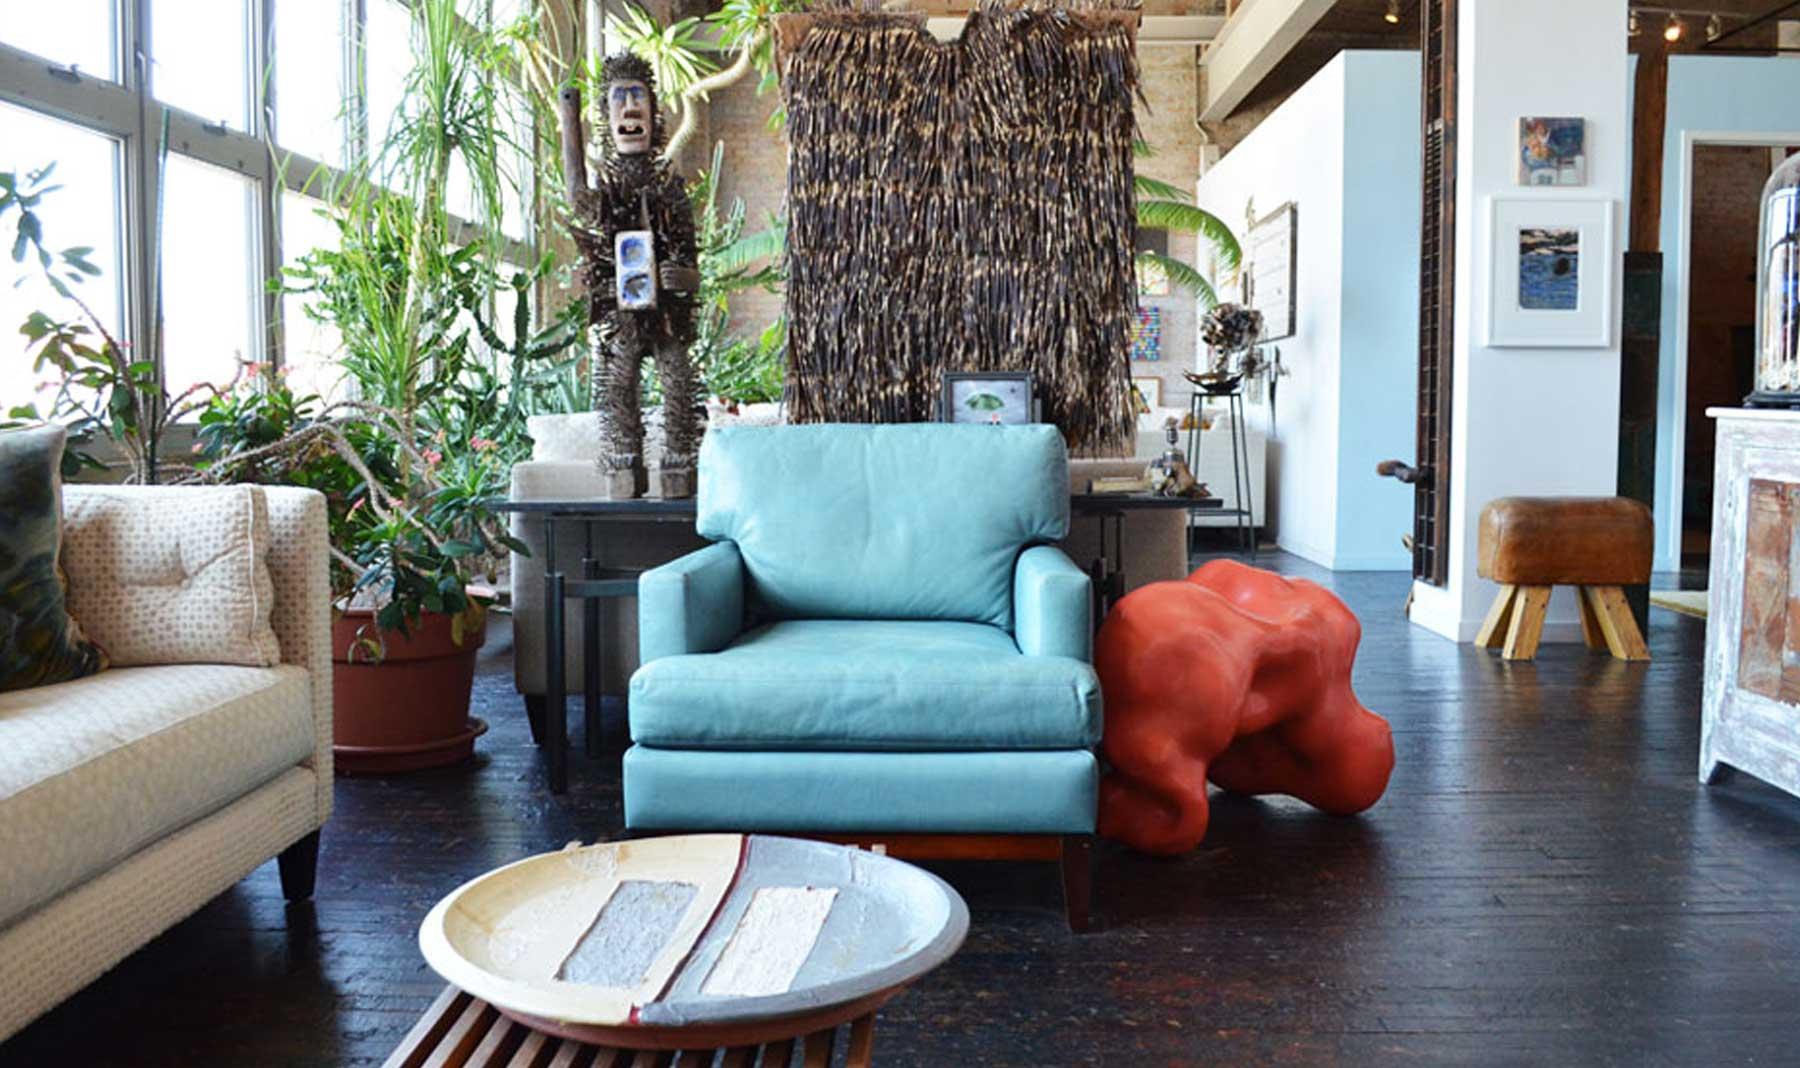 Artist Nick Cave's sofa